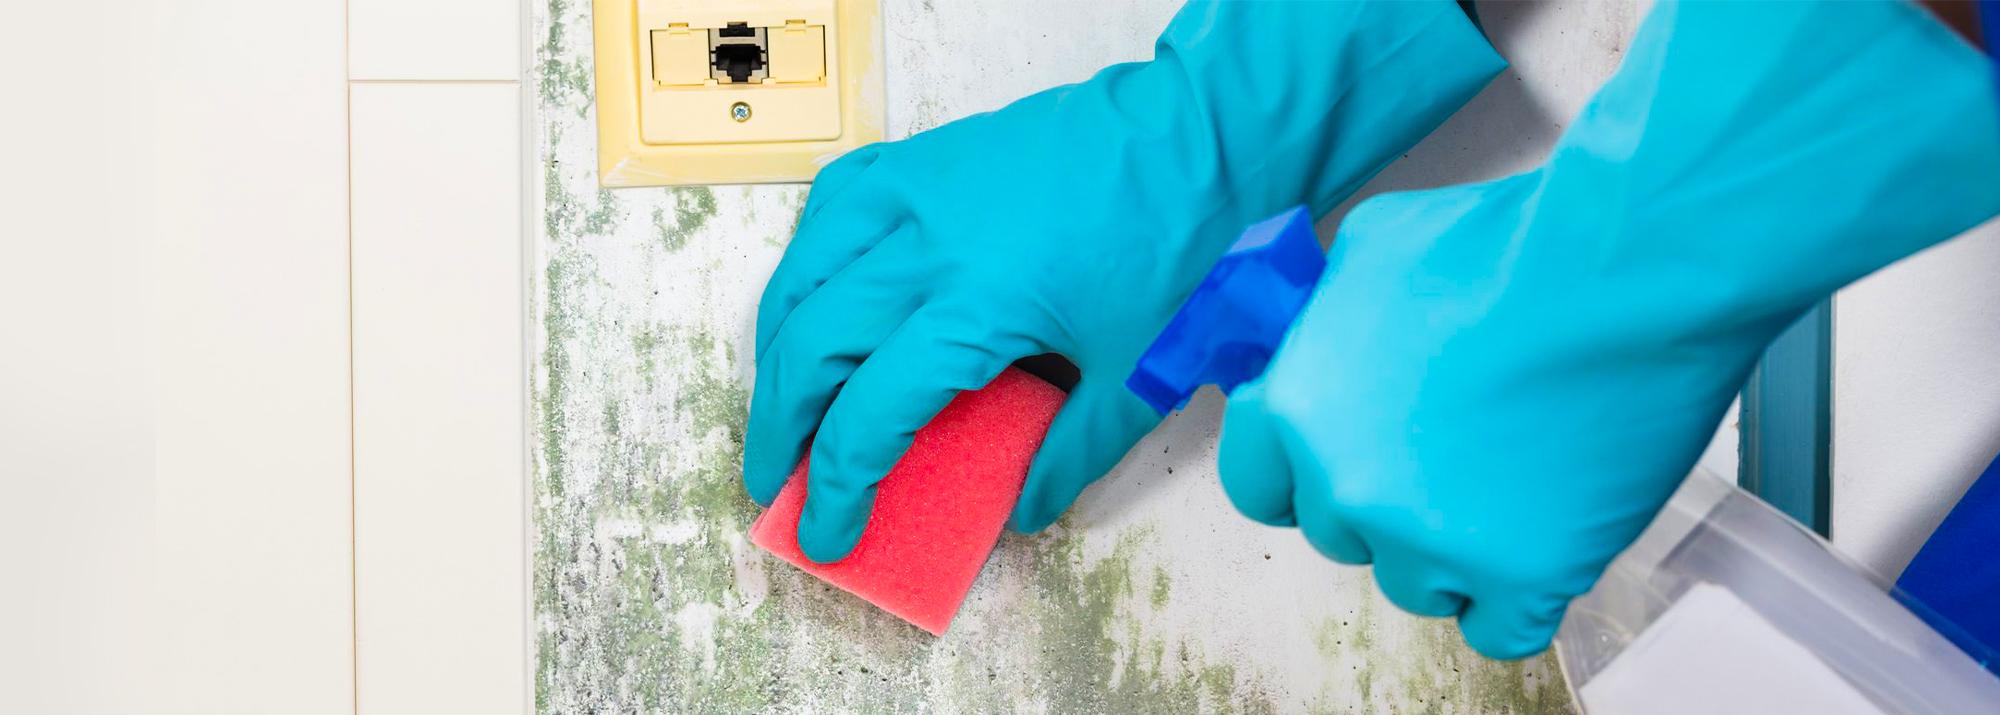 Descubra o que fazer para tirar bolor e mofo das paredes da sua casa